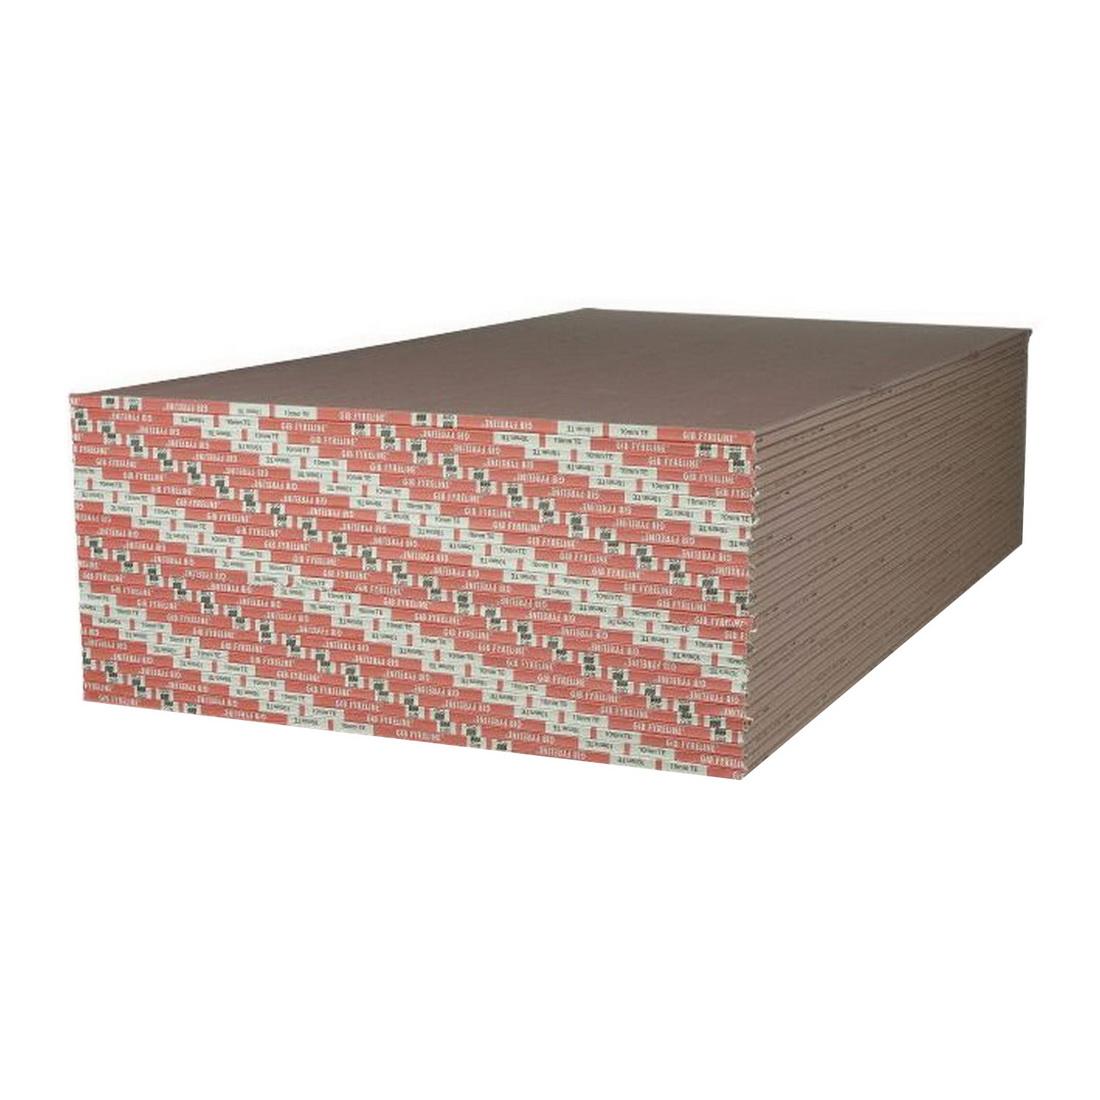 Fyreline Plasterboard 2700 x 1200 x 16mm 11566